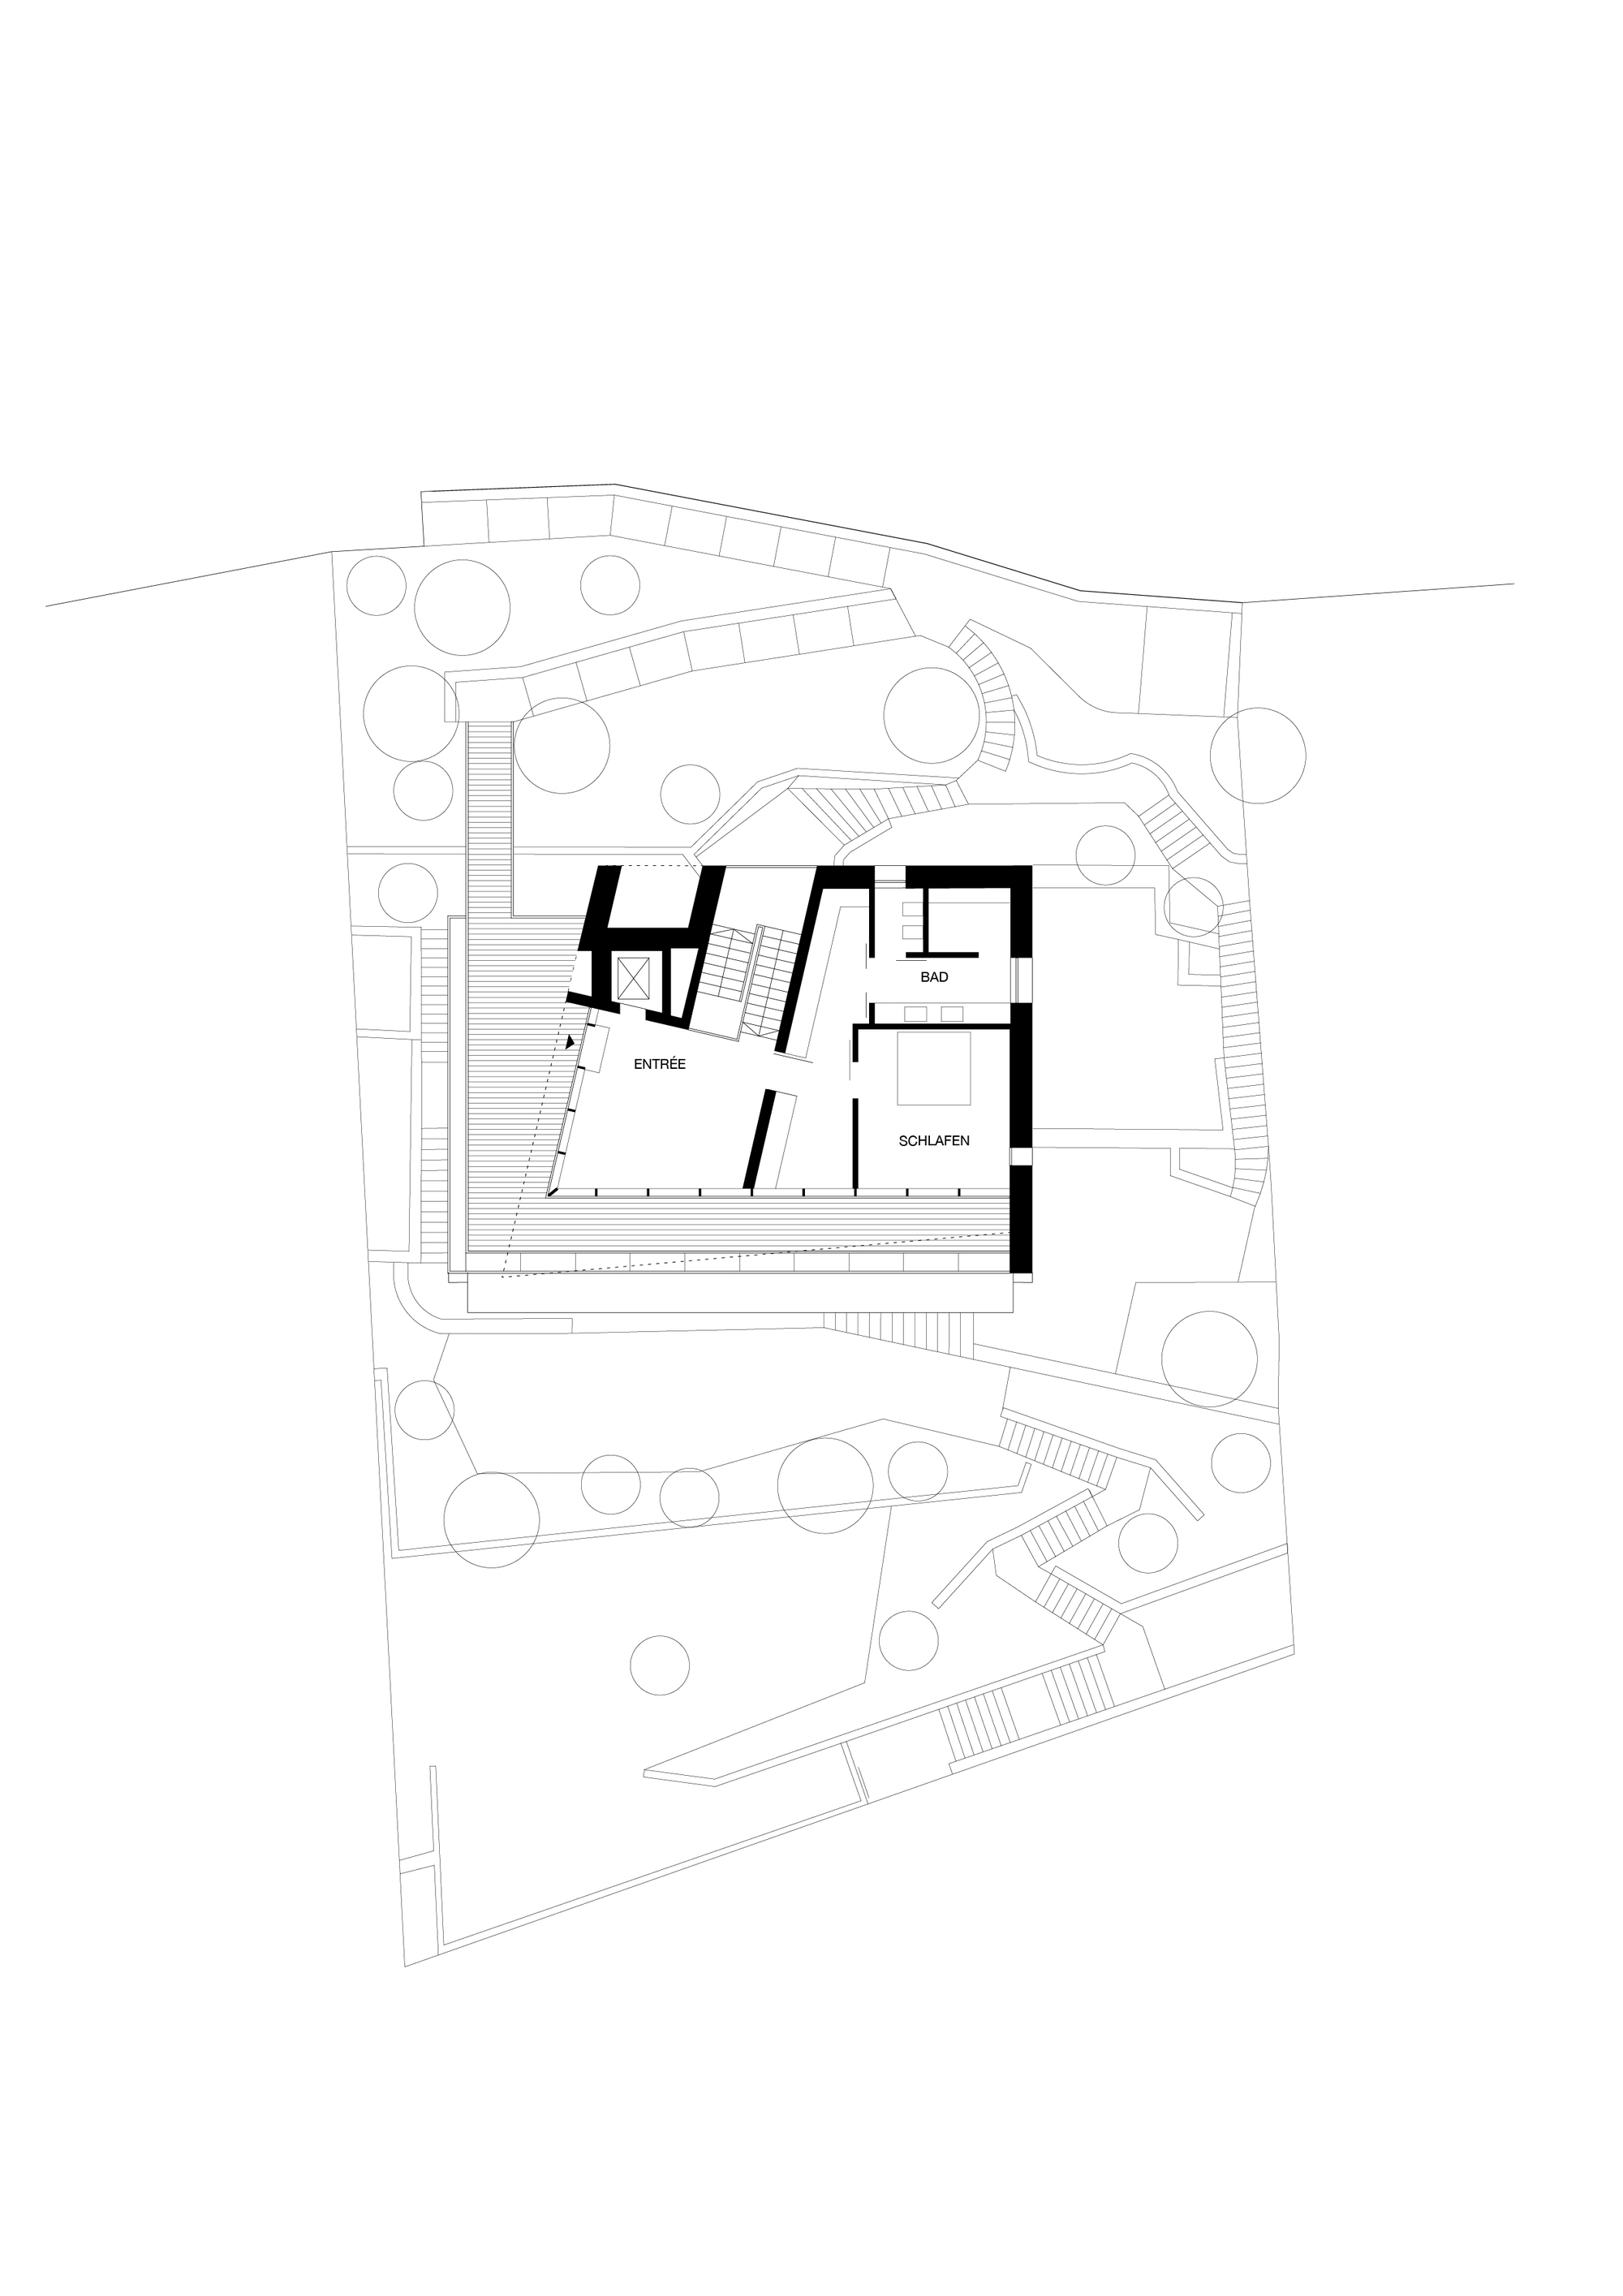 galer a de haus b yonder architektur und design 20. Black Bedroom Furniture Sets. Home Design Ideas